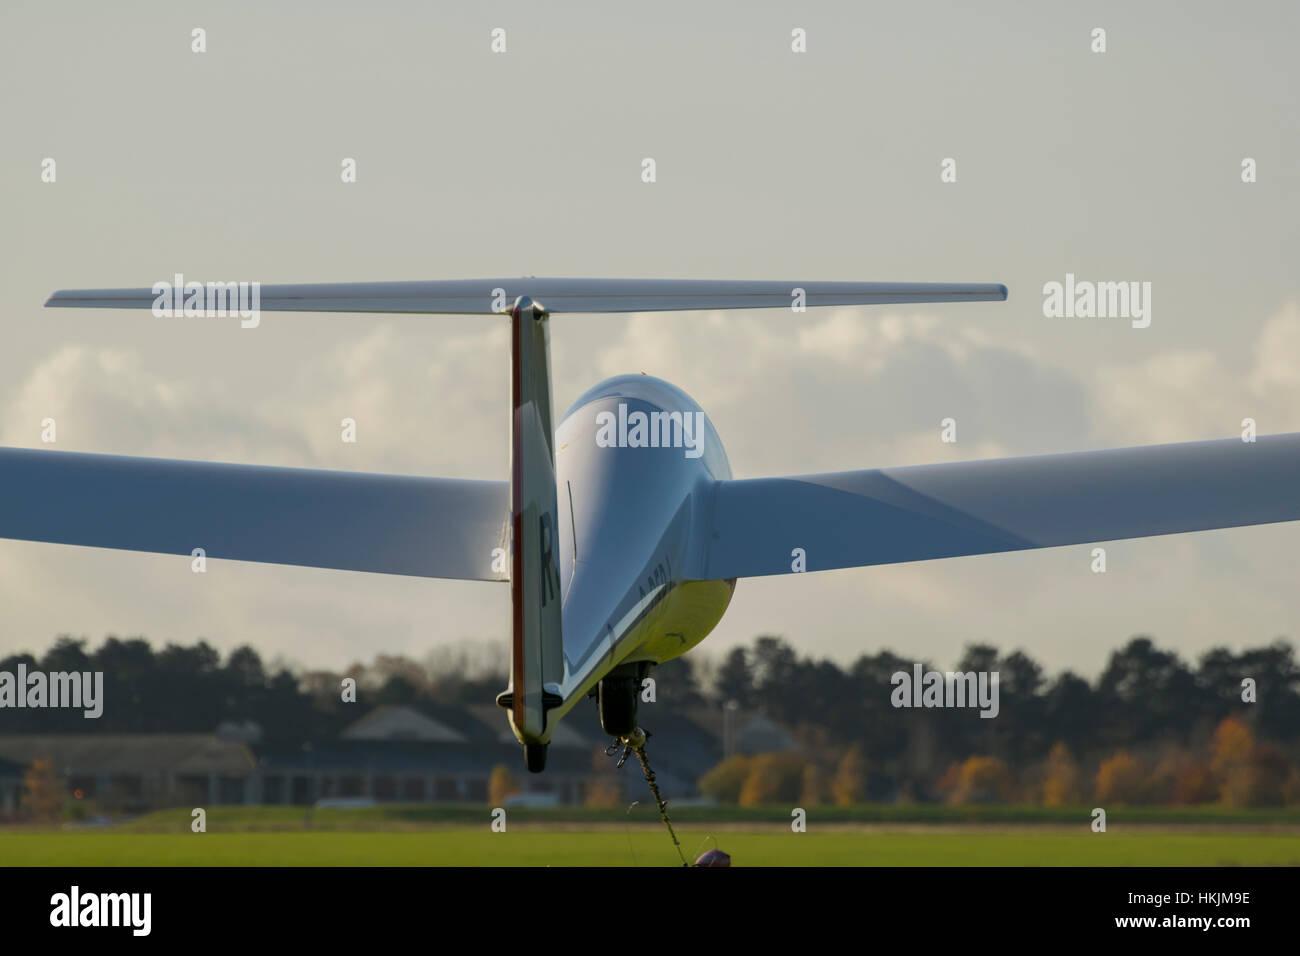 Take off - Stock Image